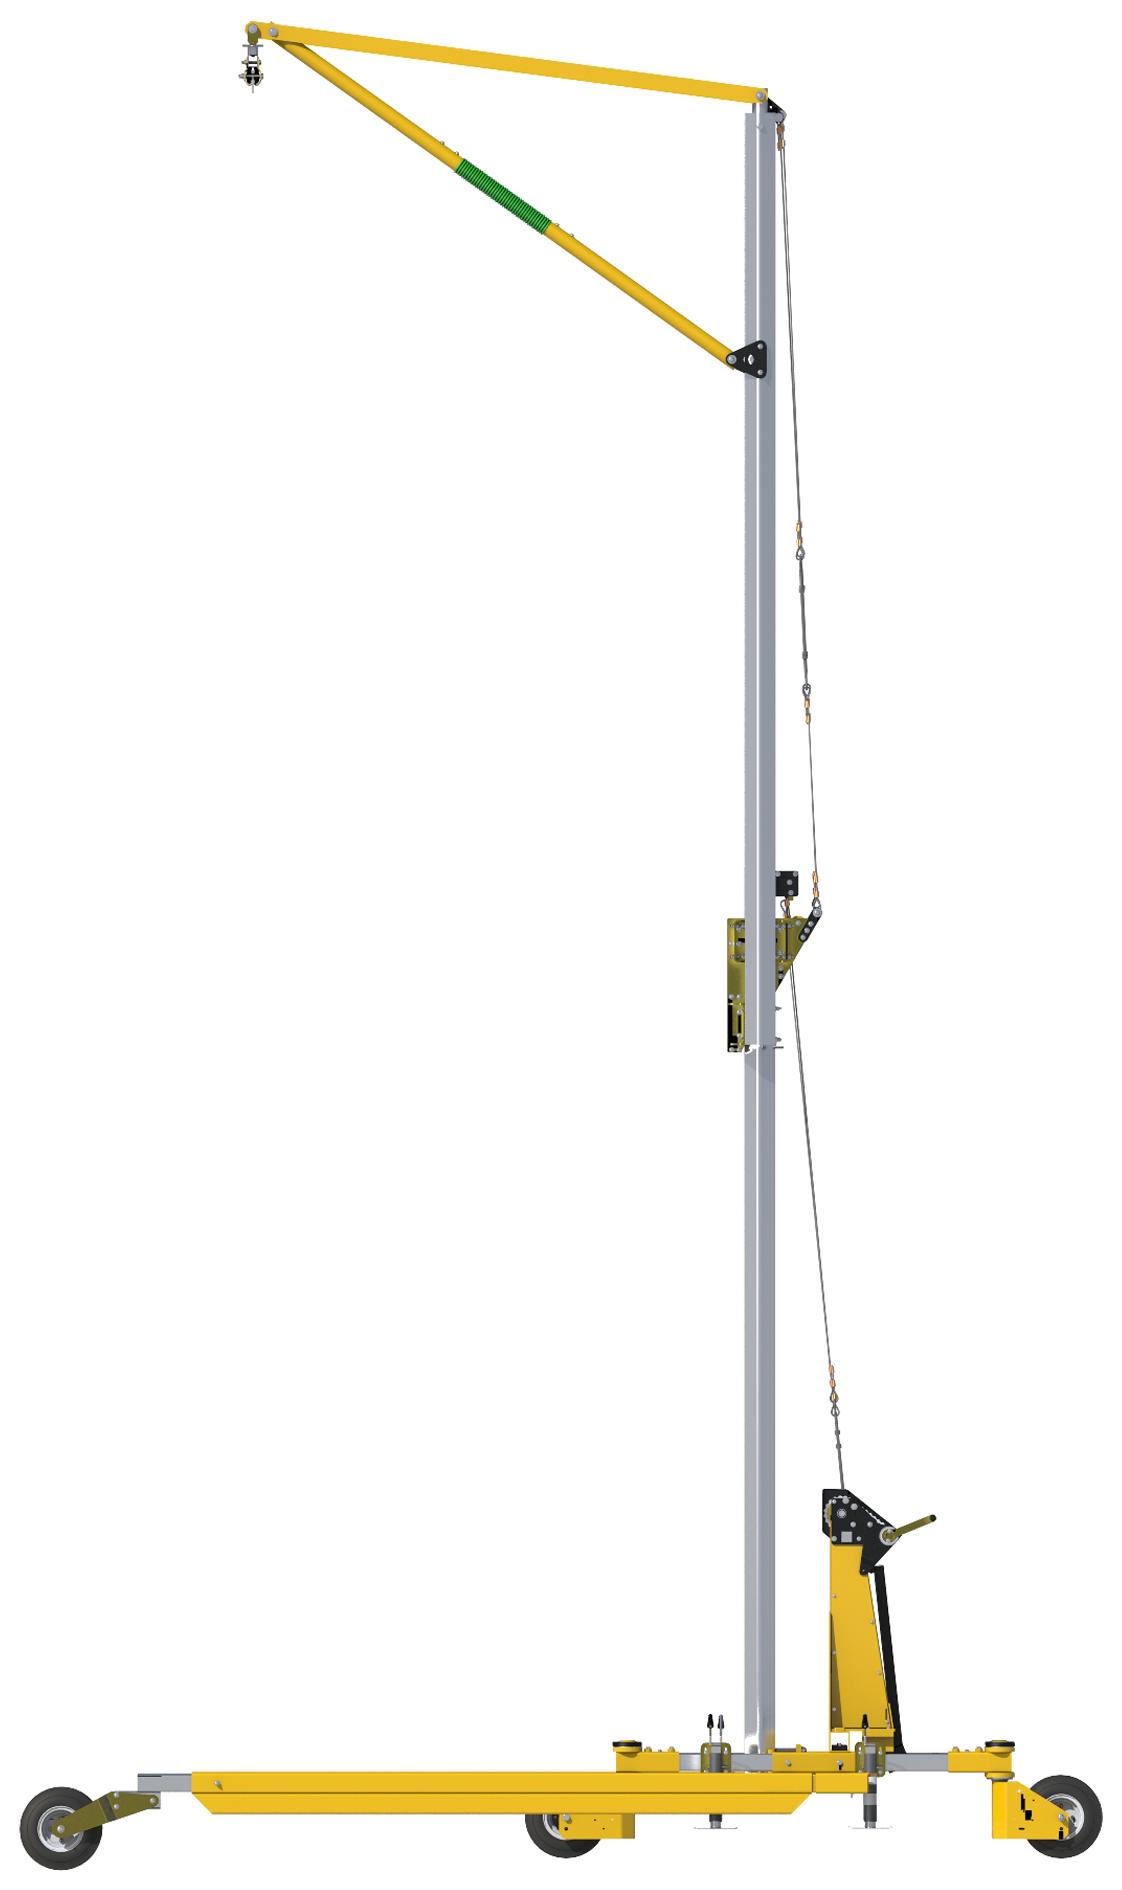 FlexiGuard Portable C-Frame Fall Arrest System Adjustable Height, Side View